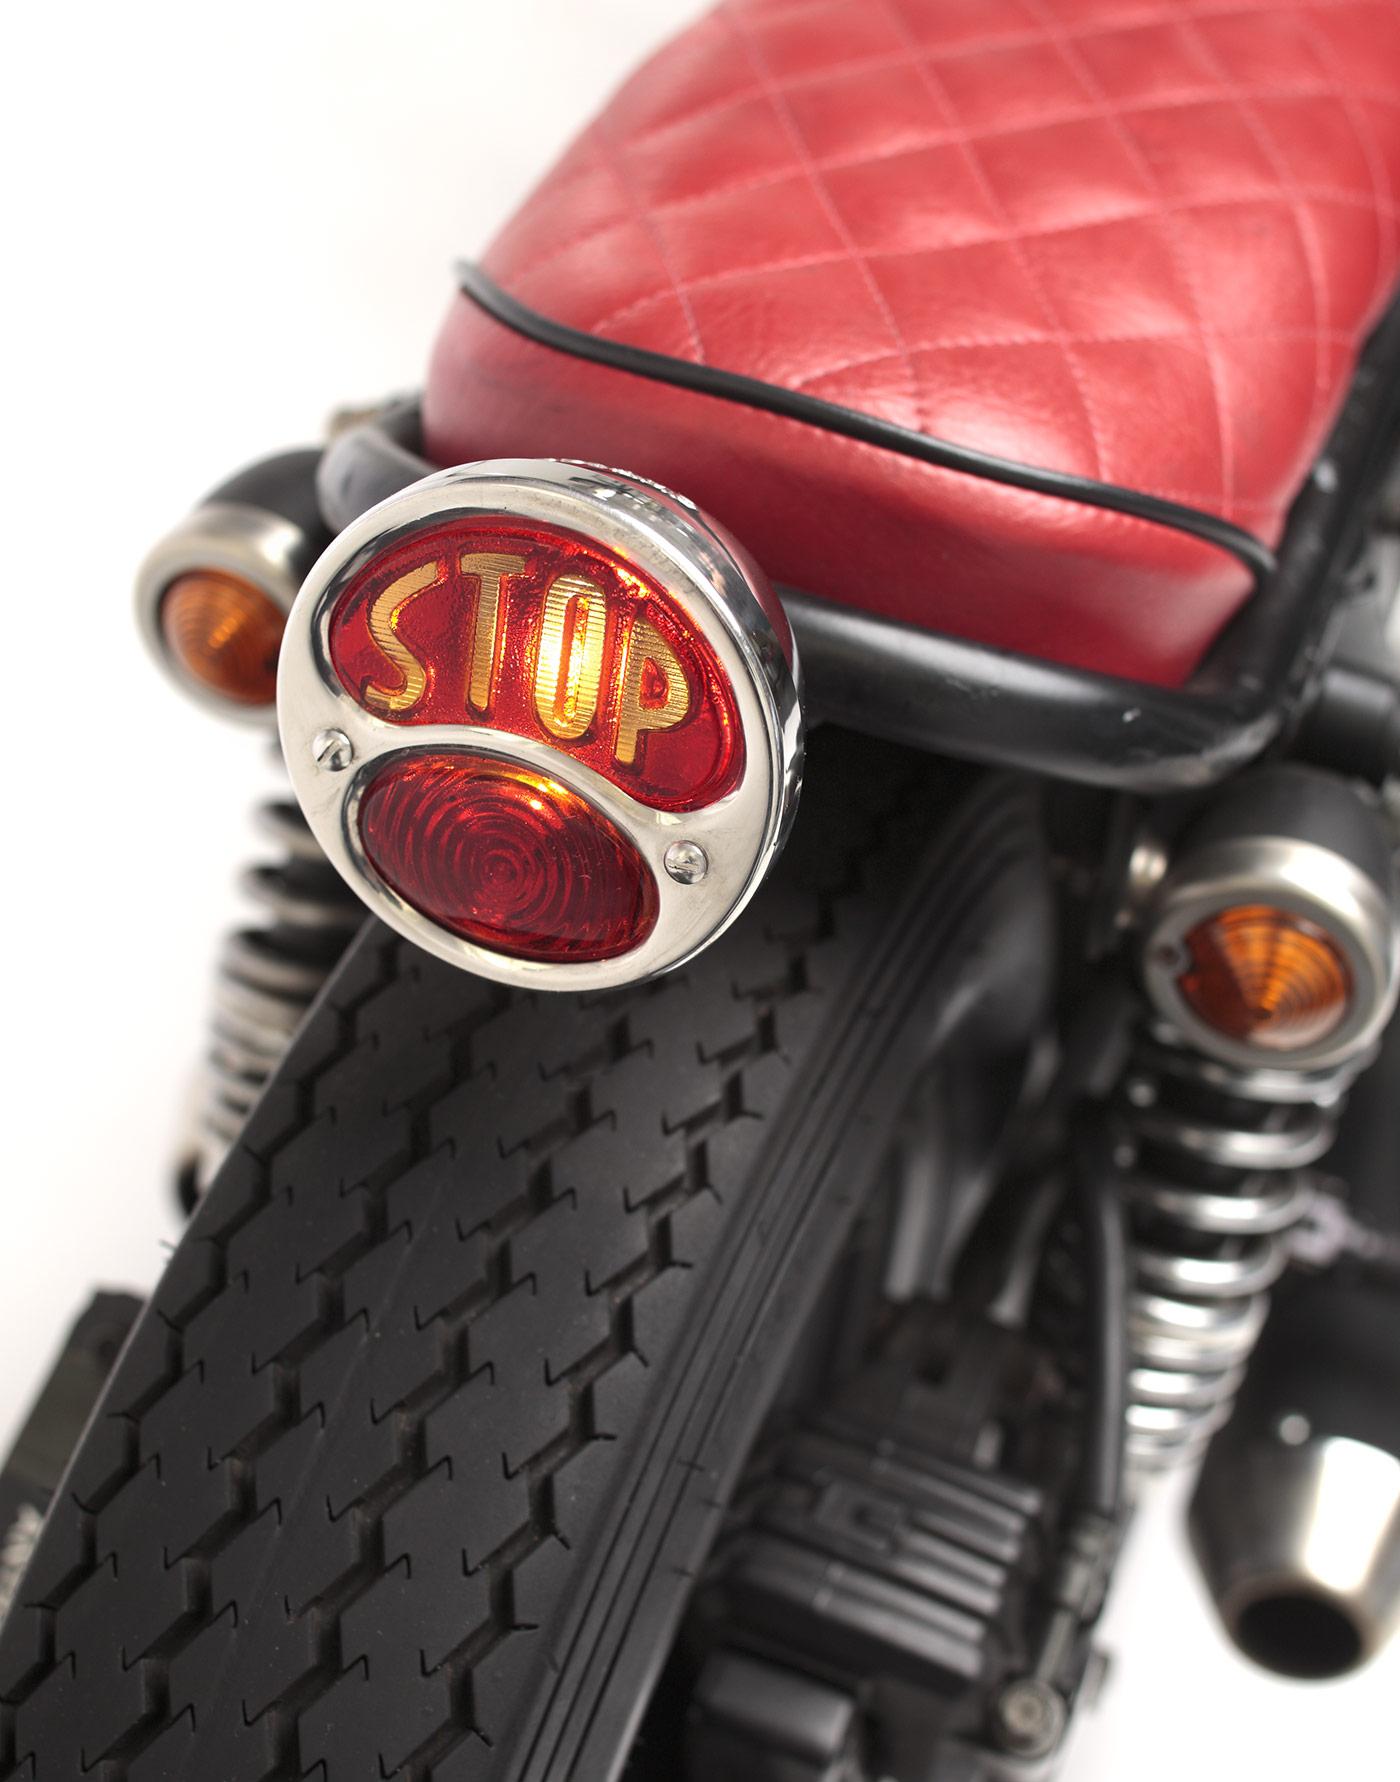 XS650 Lefty Lucy - Classified Moto